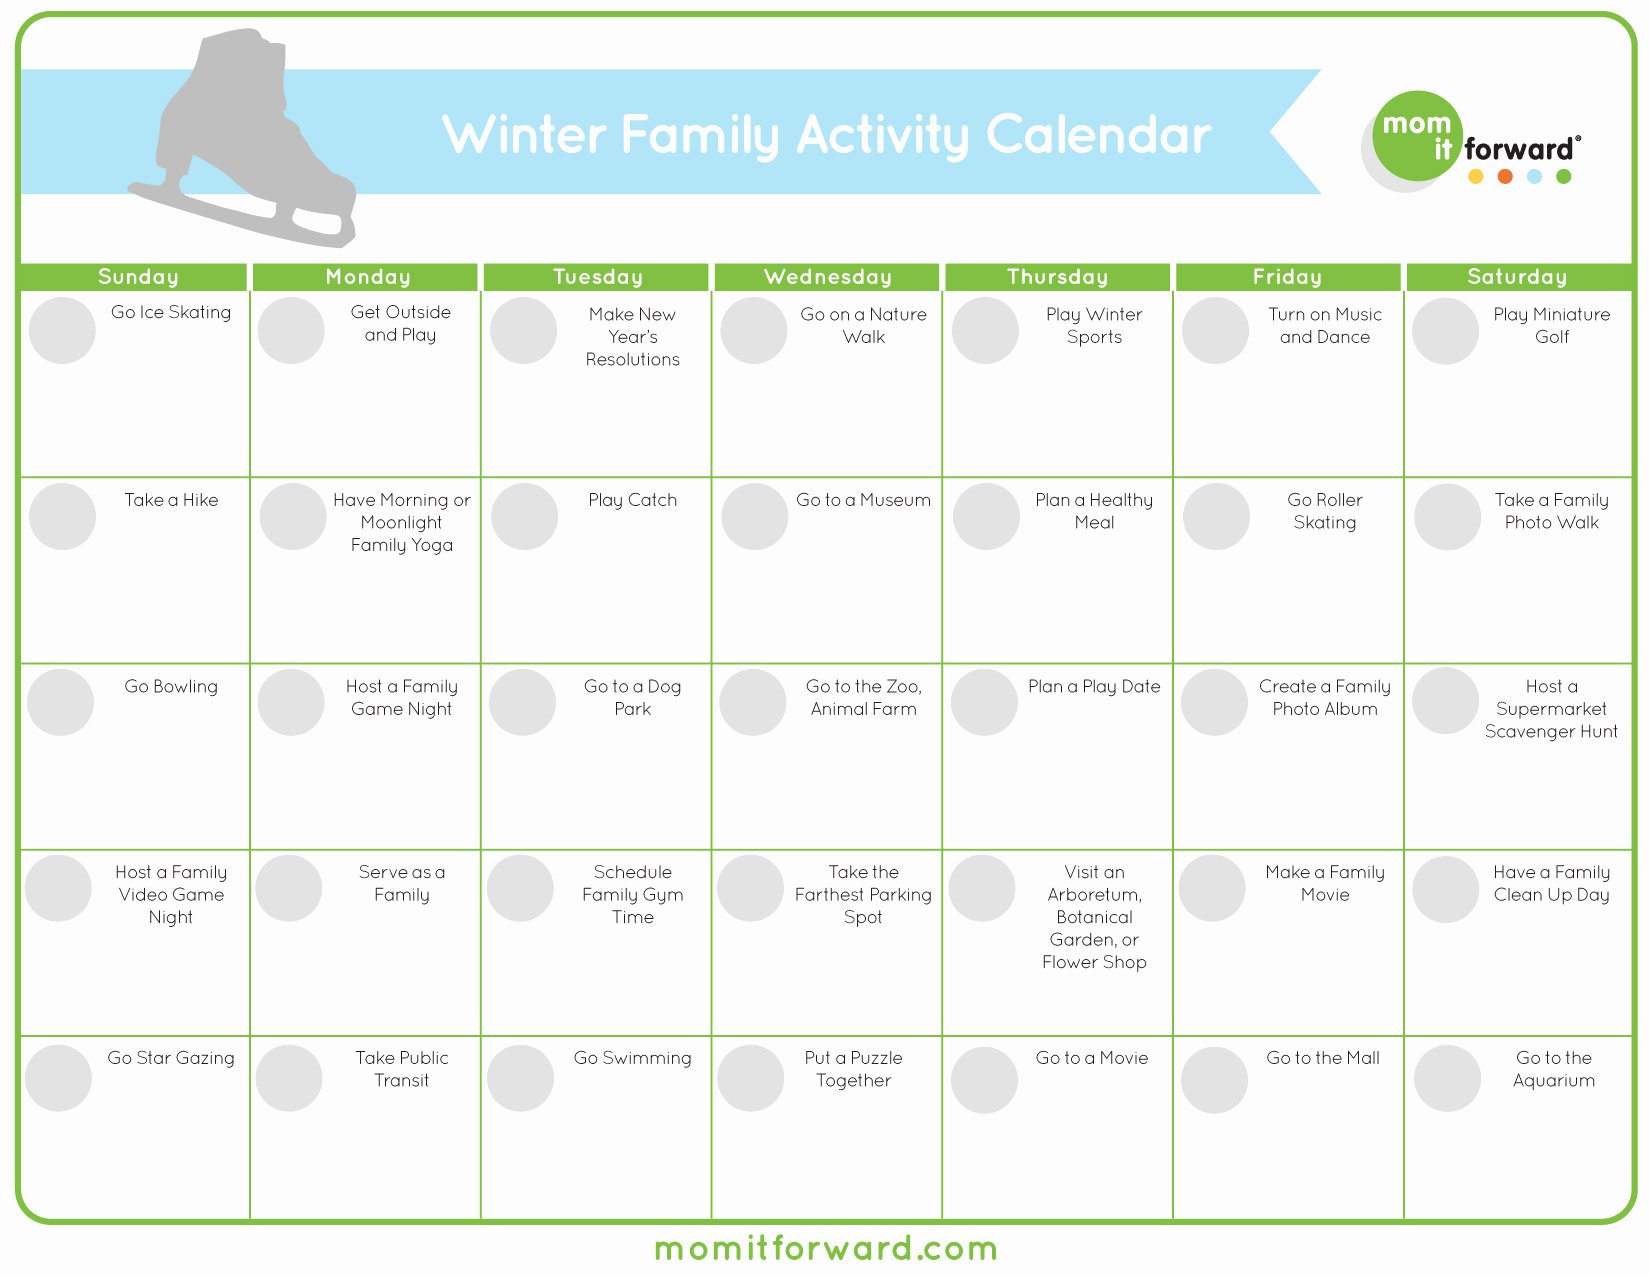 Free Printable Family Calendar Elegant Free Printable Winter Family Activity Calendar Mom It